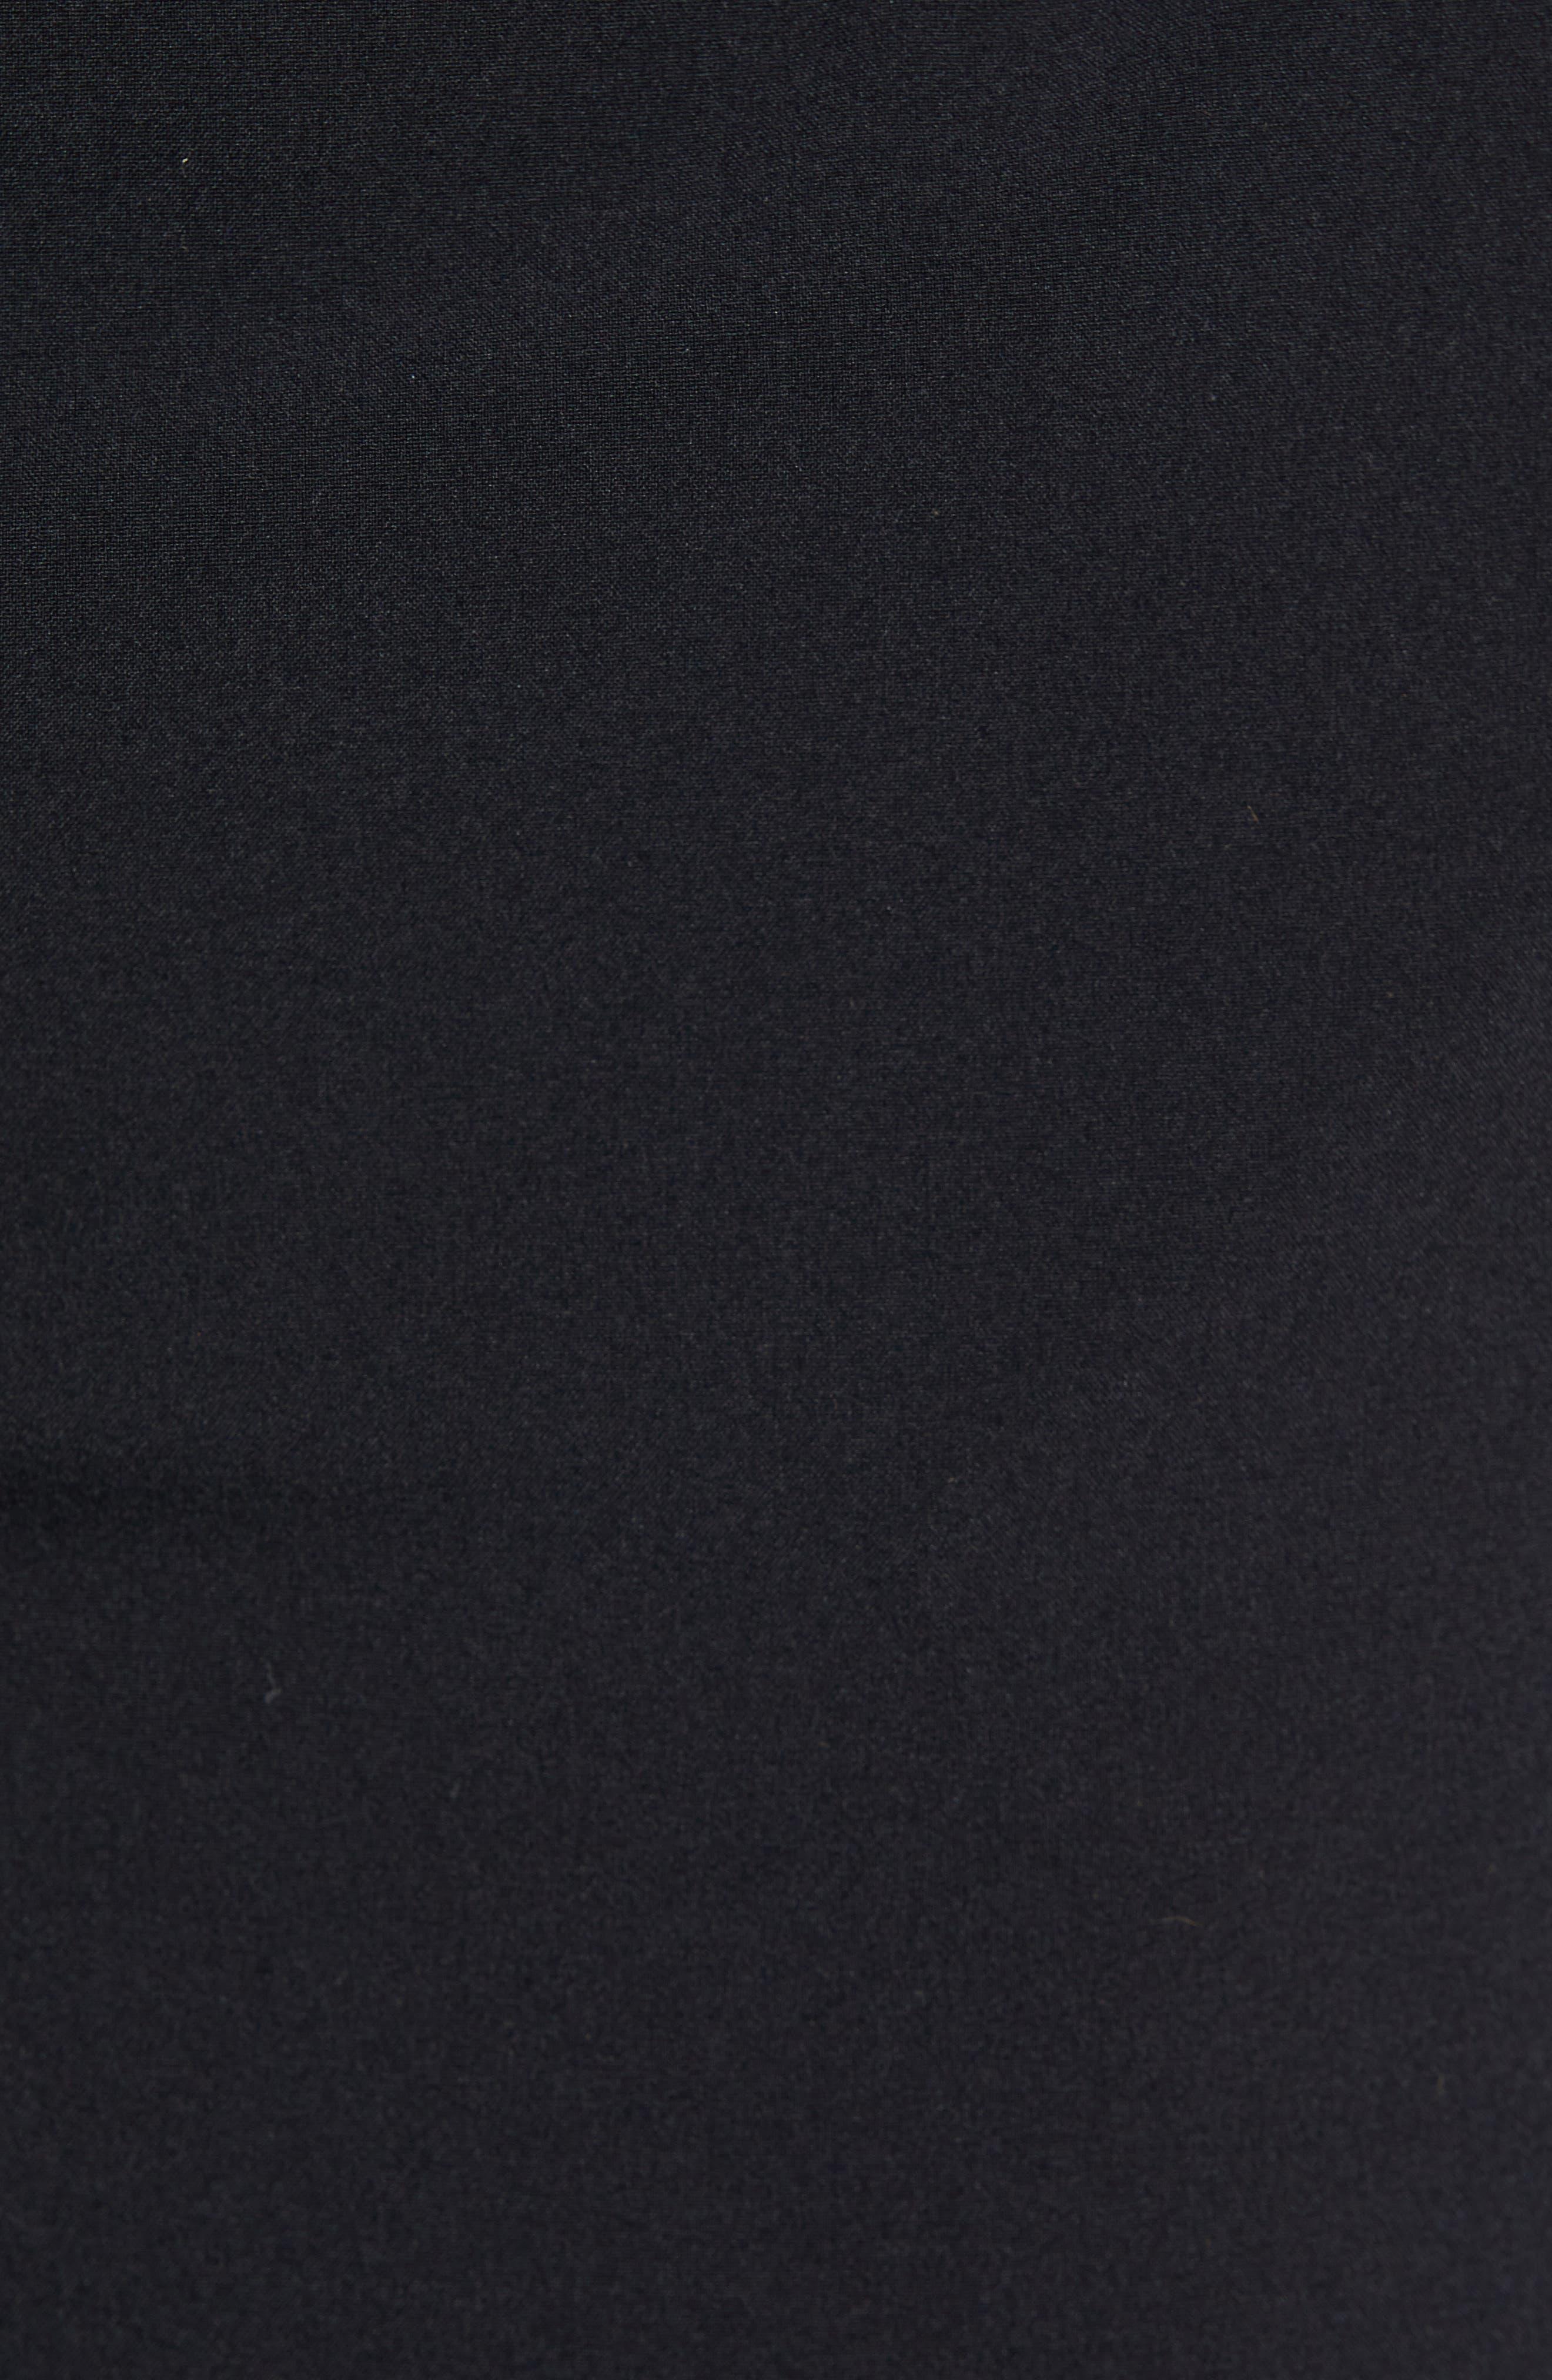 RHONE, Mako Lined Shorts, Alternate thumbnail 5, color, BLACK